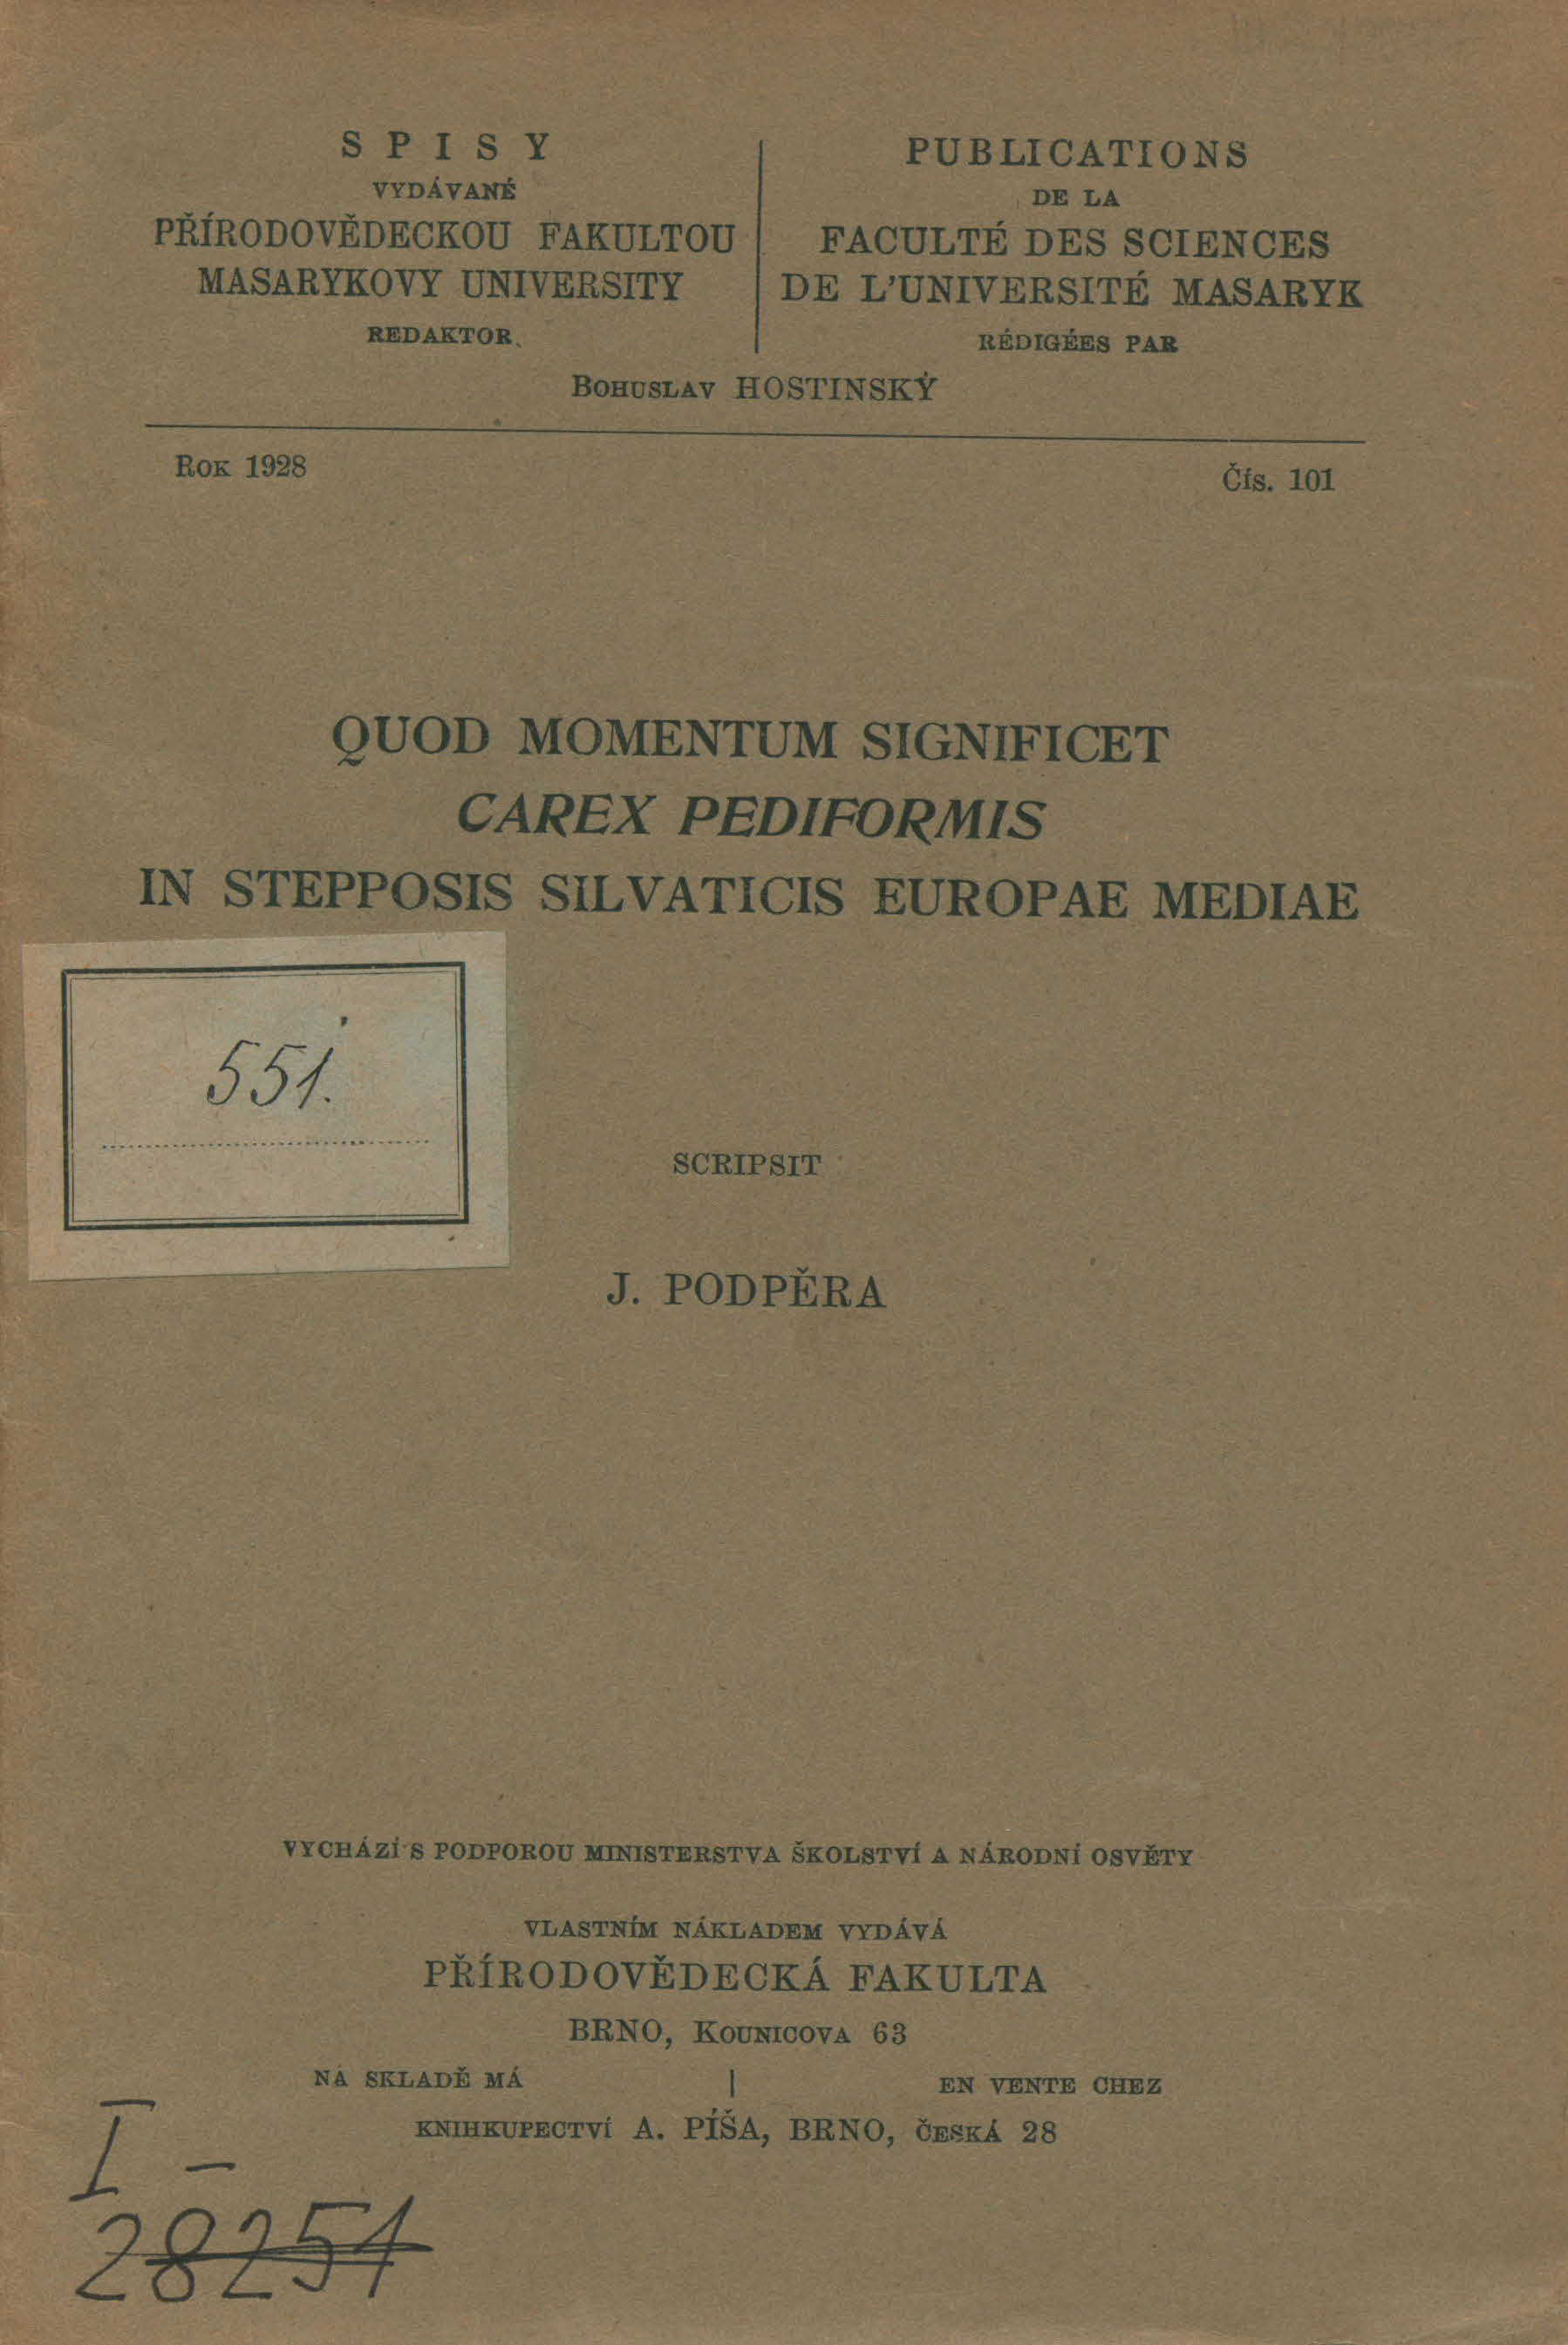 Obálka pro Quod momentum significet Carex pediformis in stepposis silvaticis Europae mediae